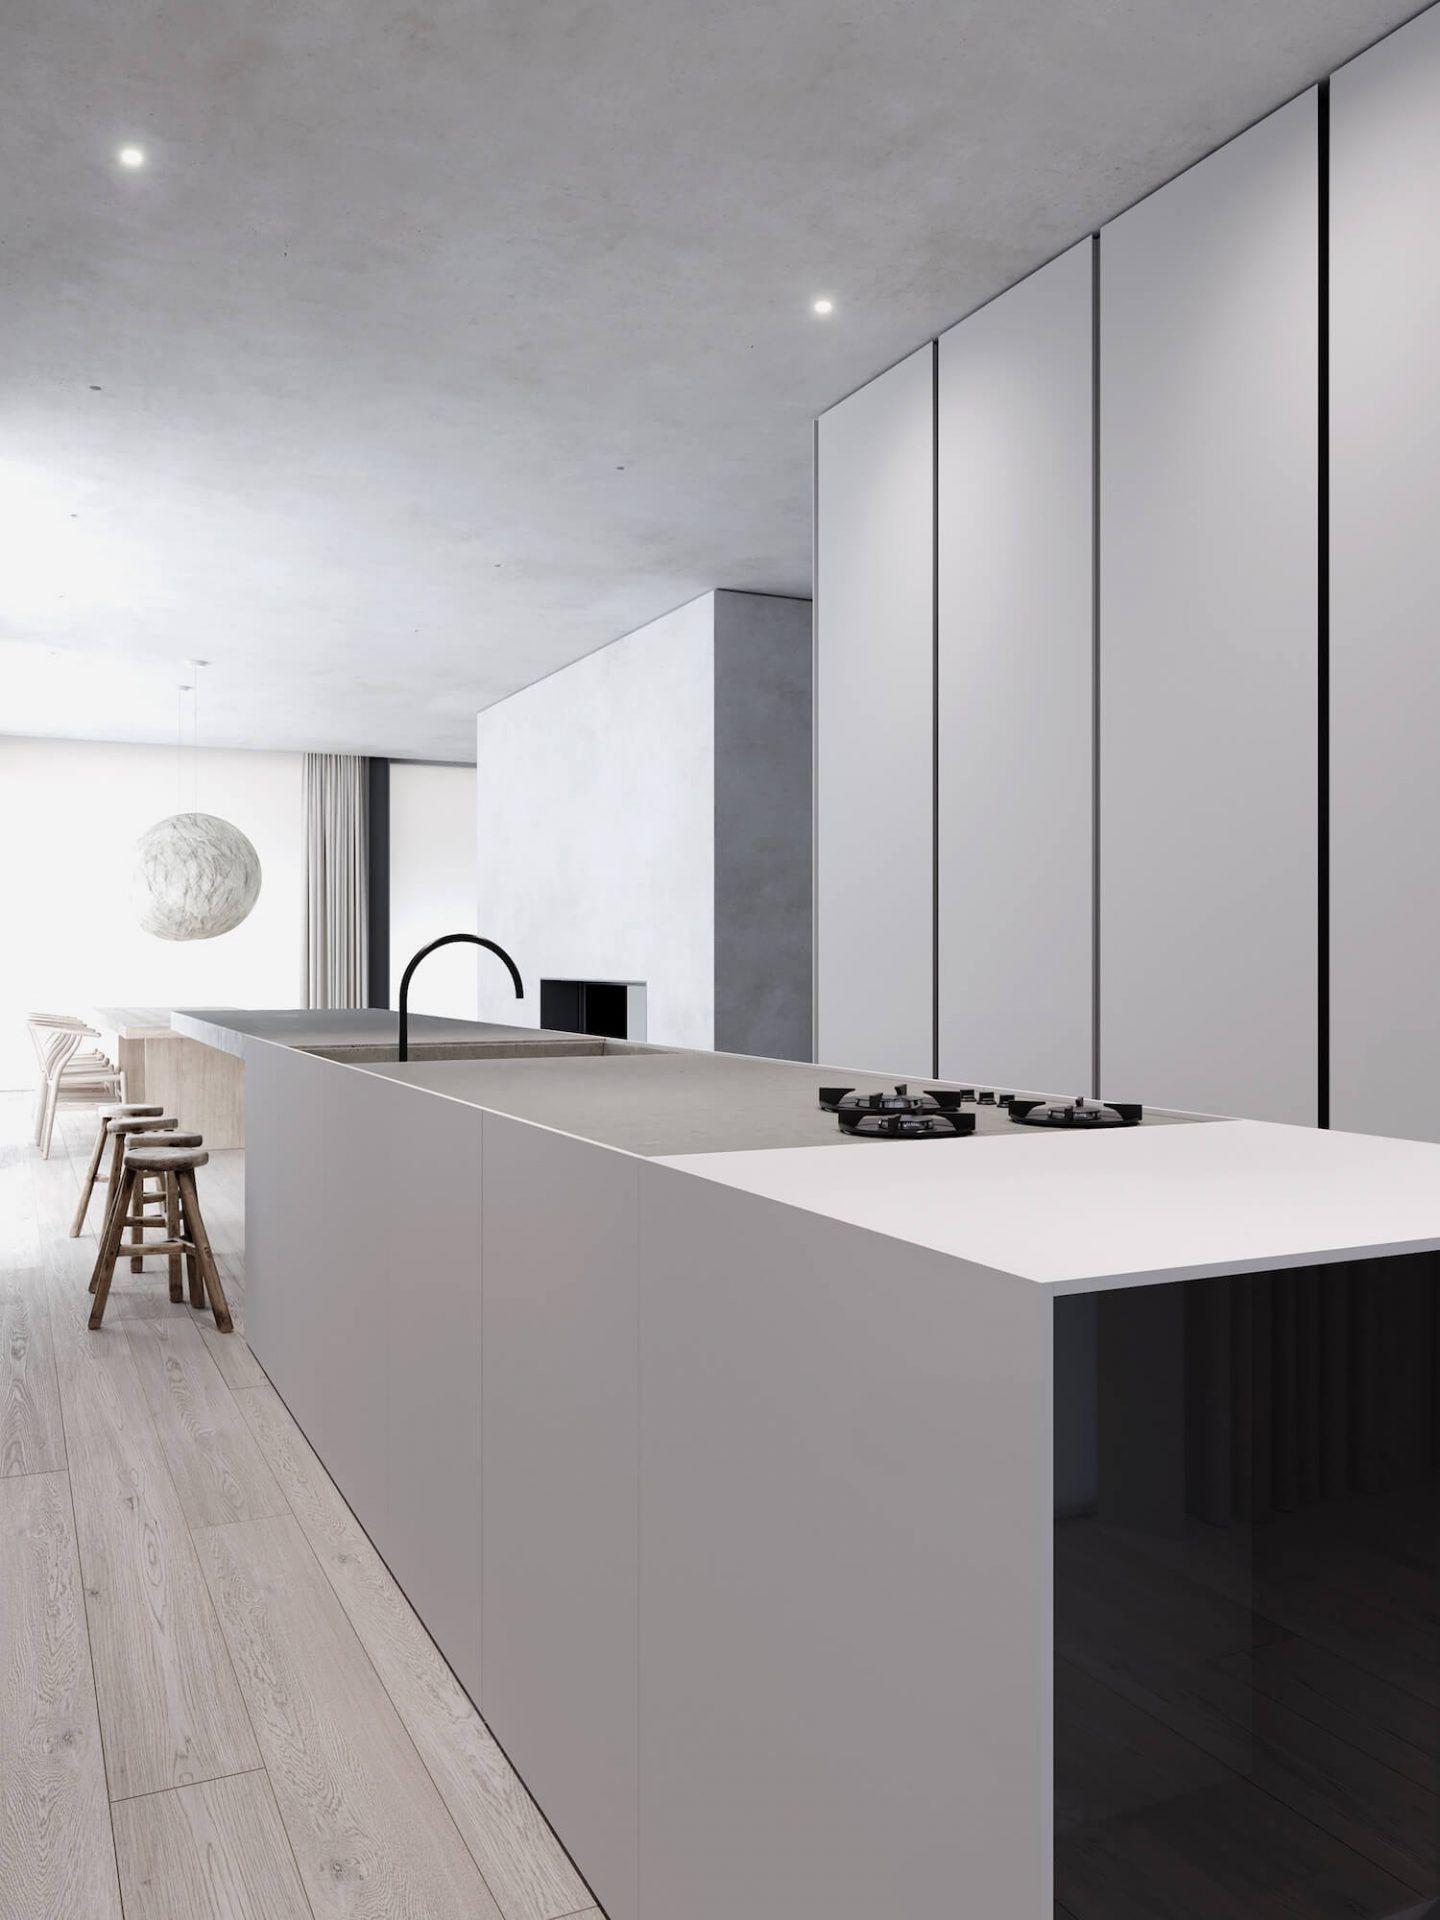 IGNANT-Architecture-Tamizo-Warsaw-House-4